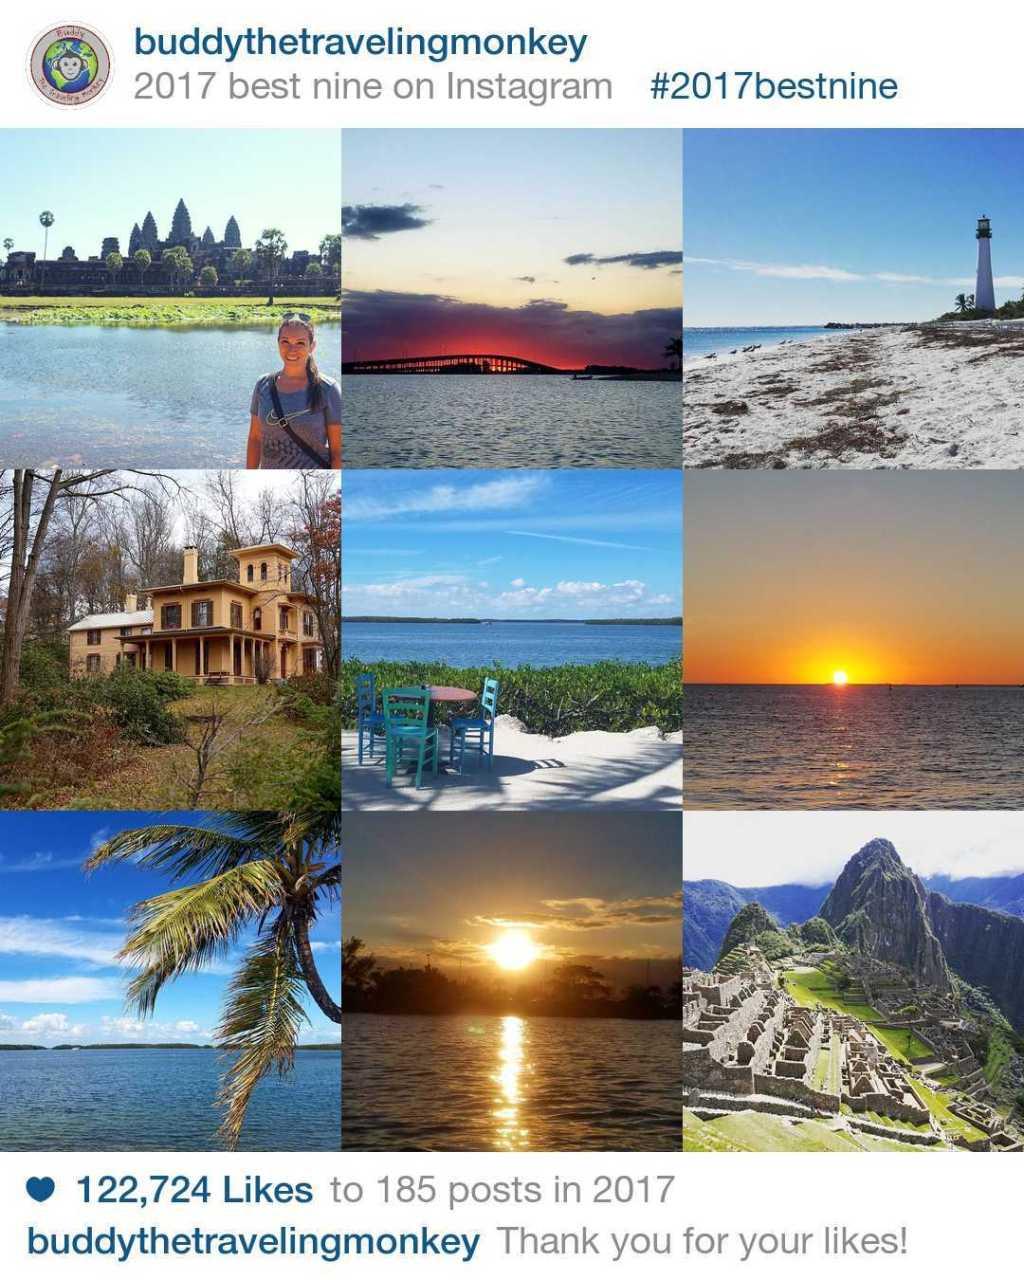 2017 Best Nine Instagram Travel Photos